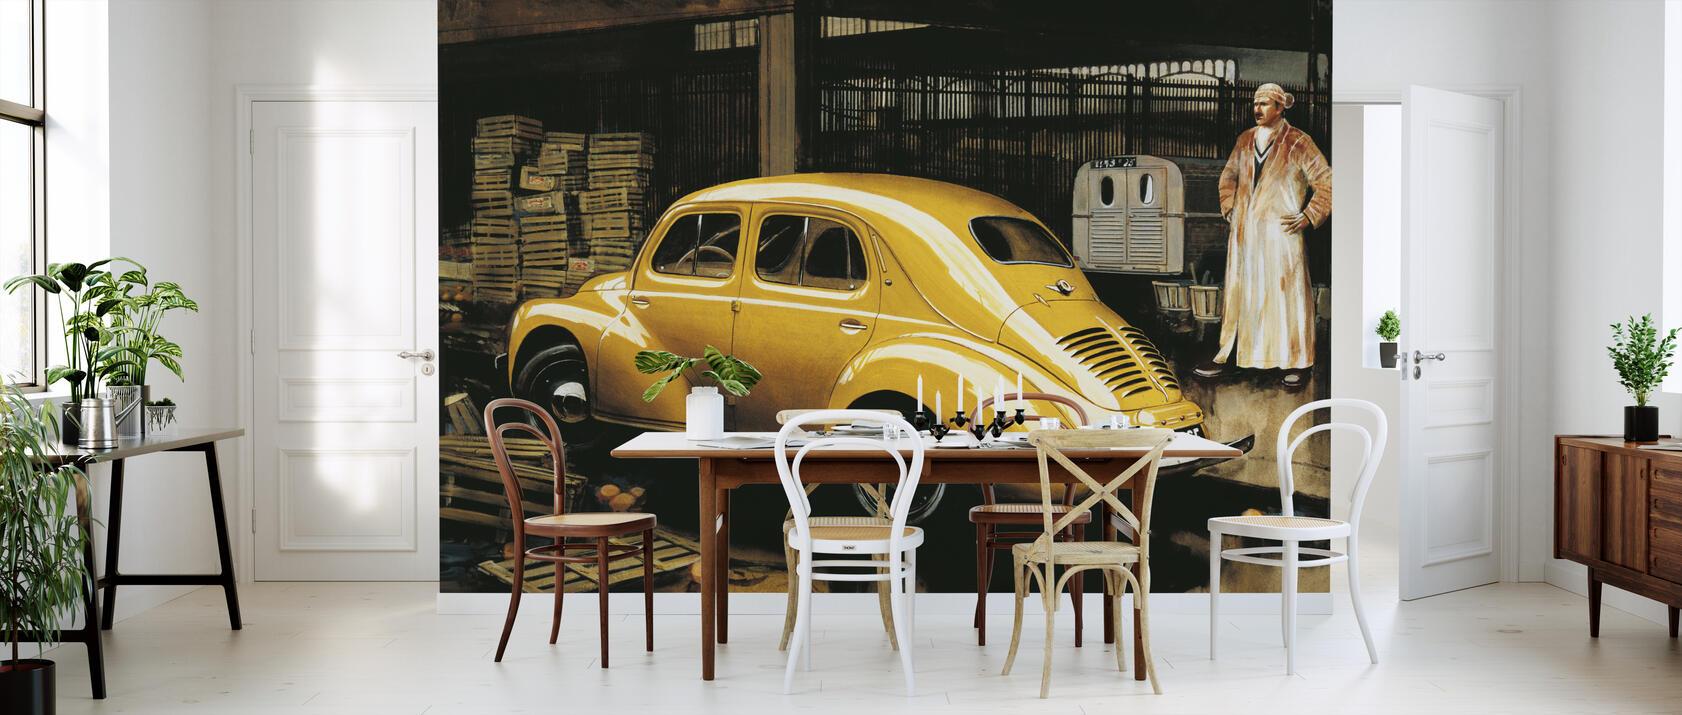 classic car fototapete nach ma photowall. Black Bedroom Furniture Sets. Home Design Ideas